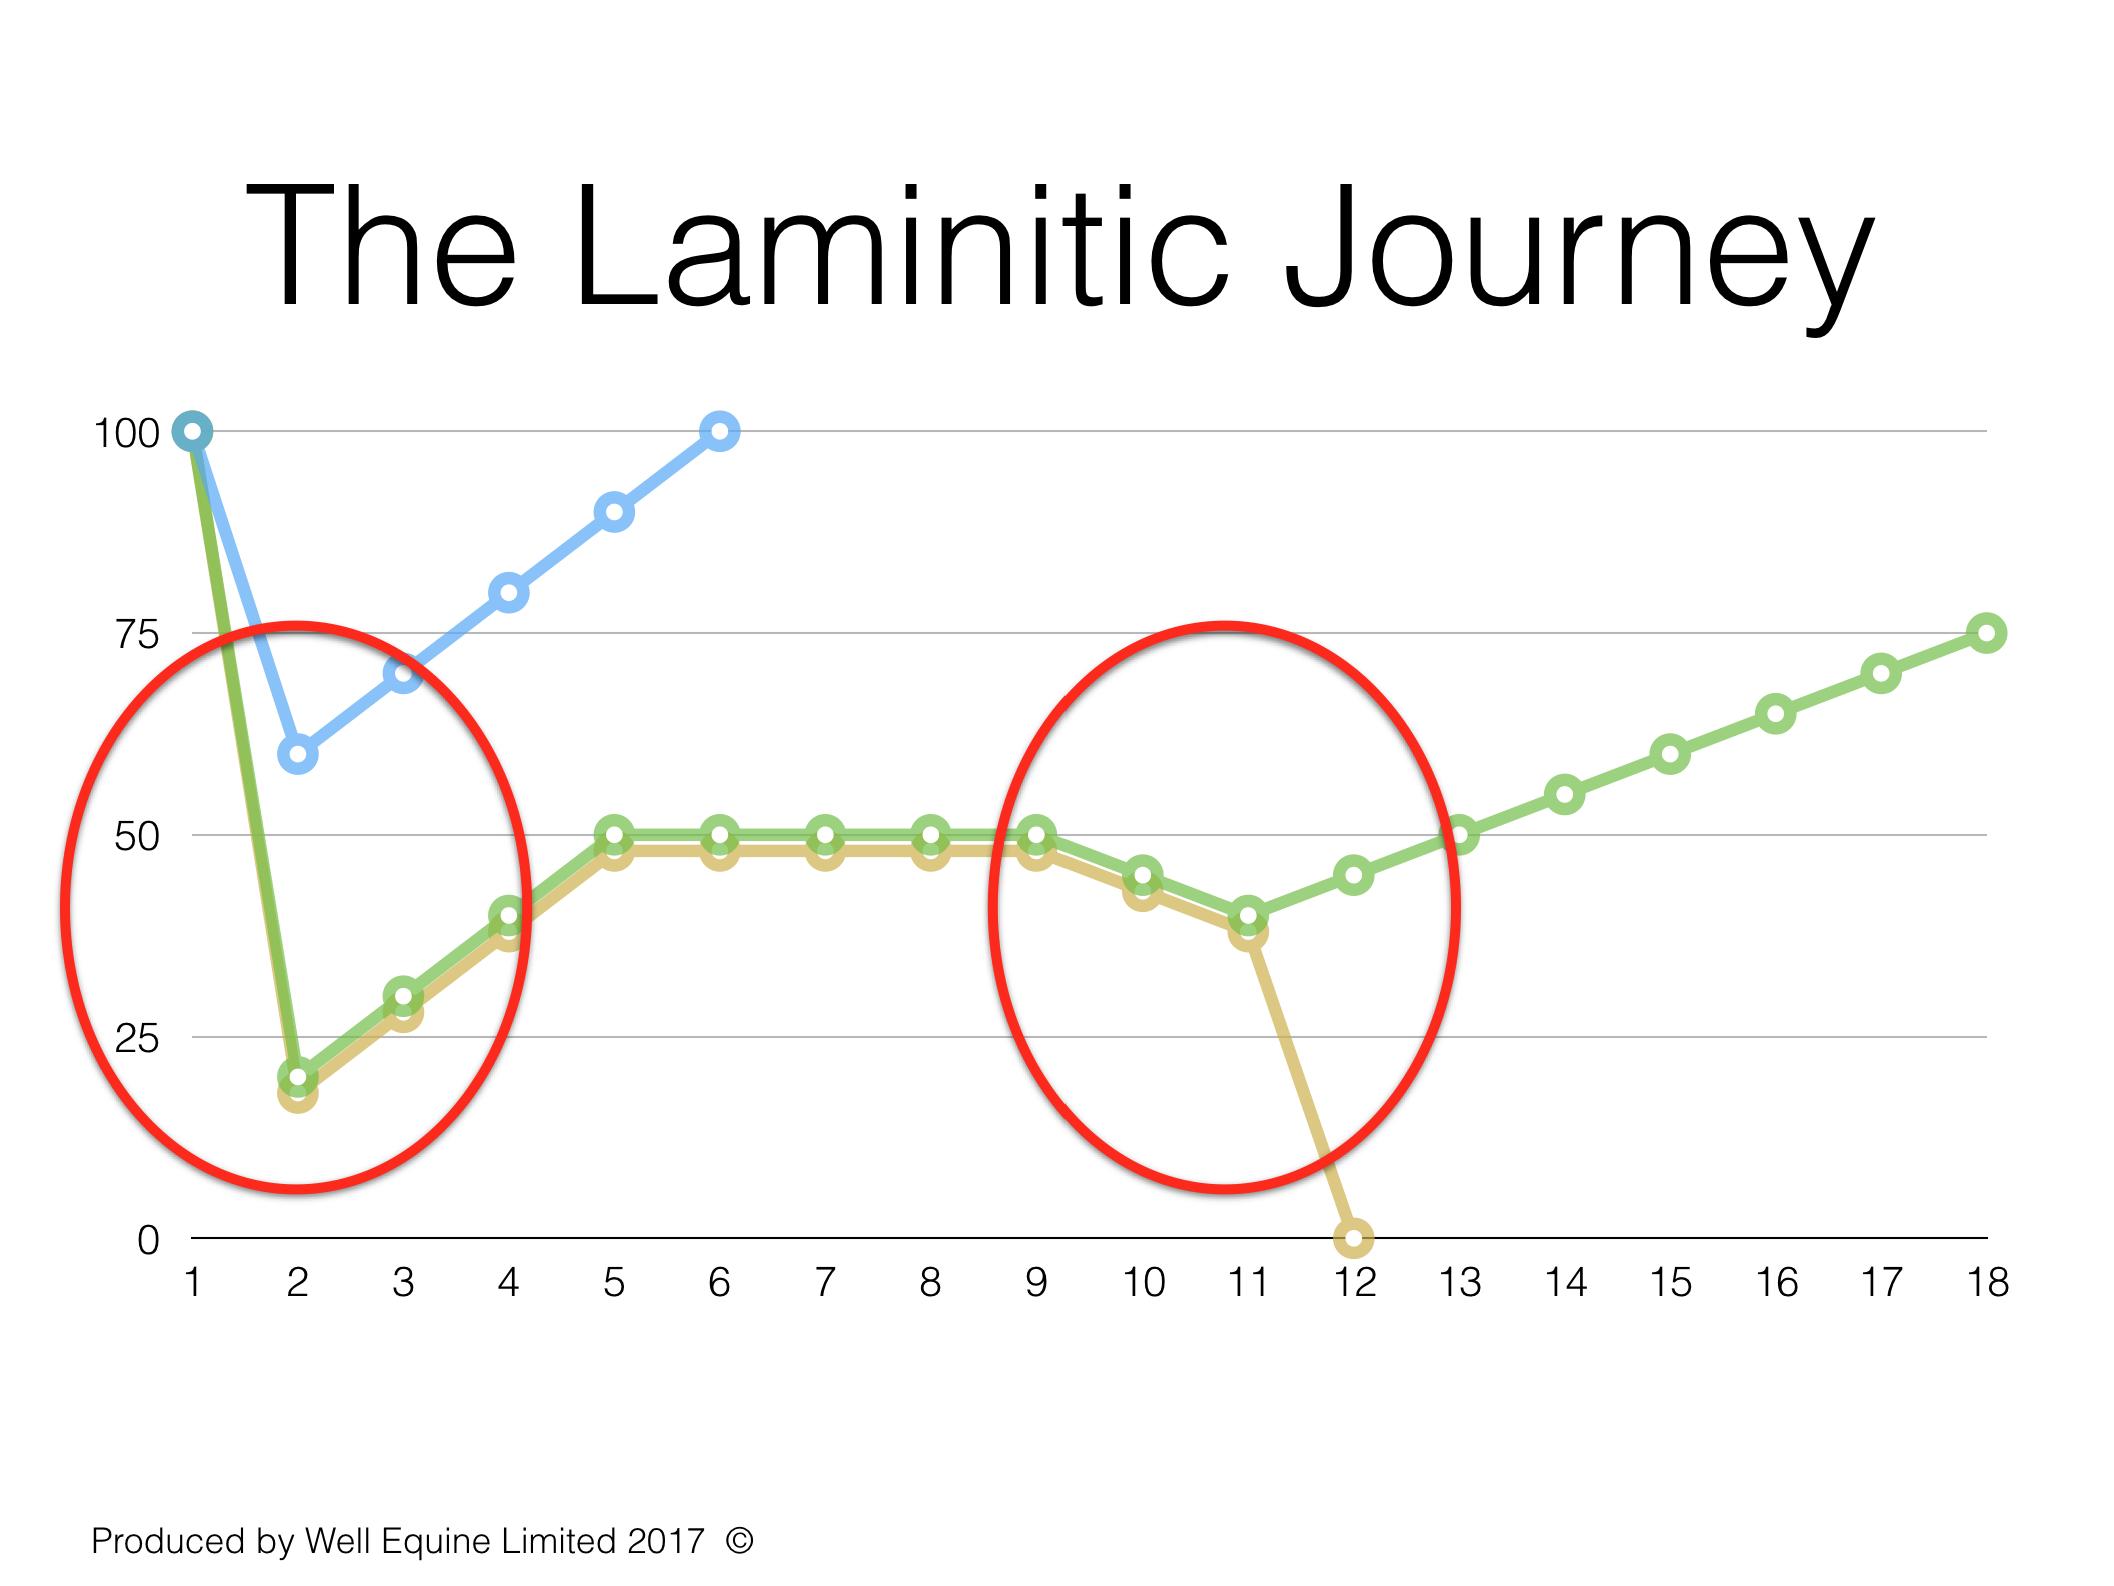 Laminitic Jouney